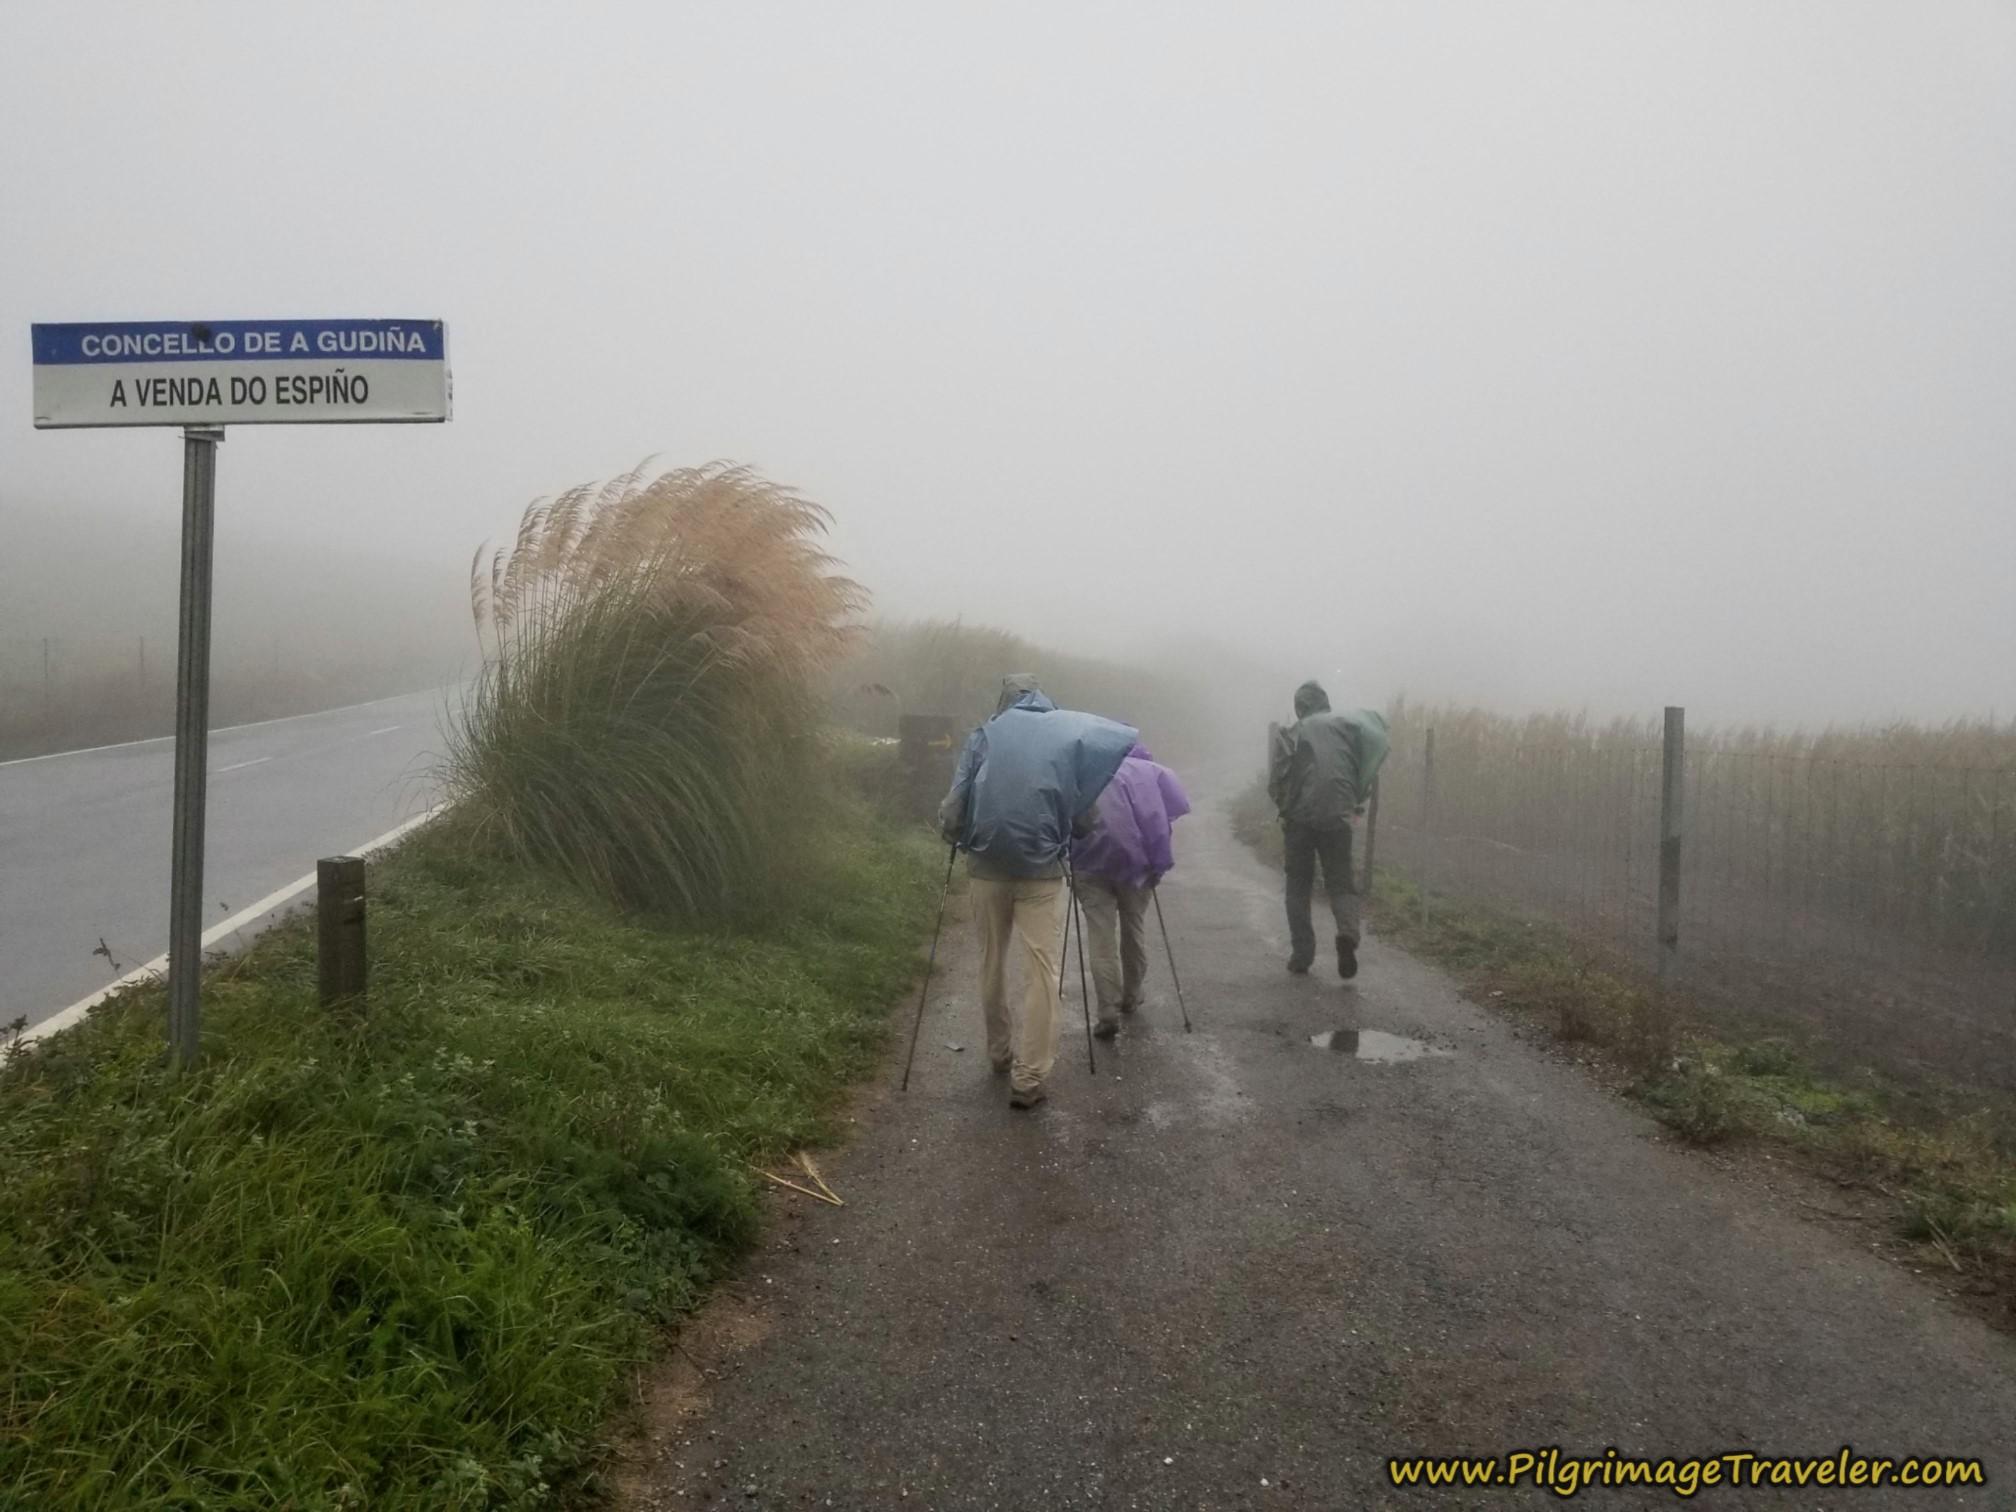 Side Road to A Venda do Espiño